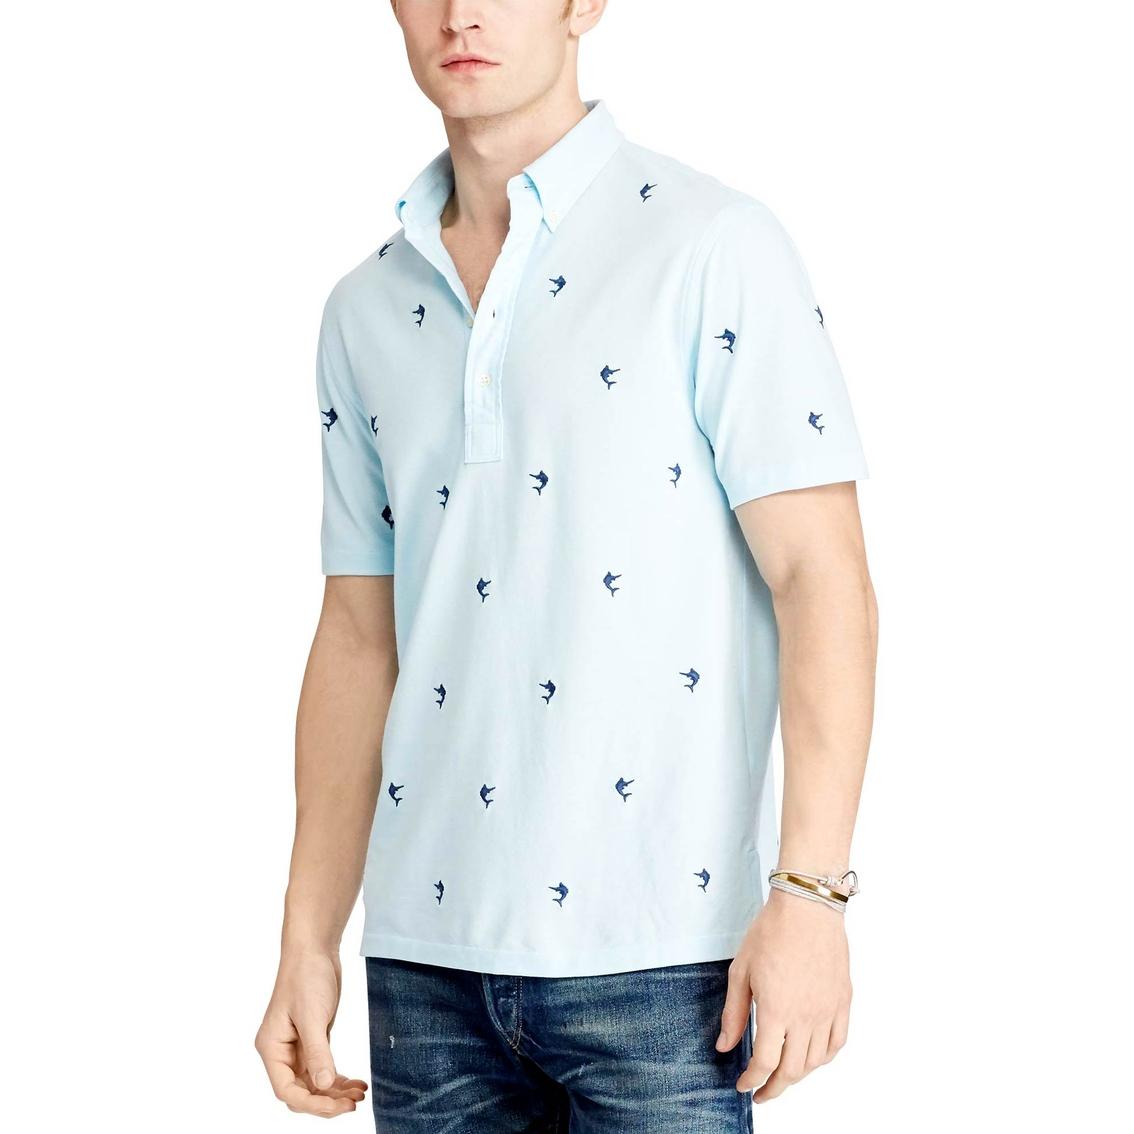 ad574798b209f Polo Ralph Lauren Hampton Marlin Embroidered Shirt